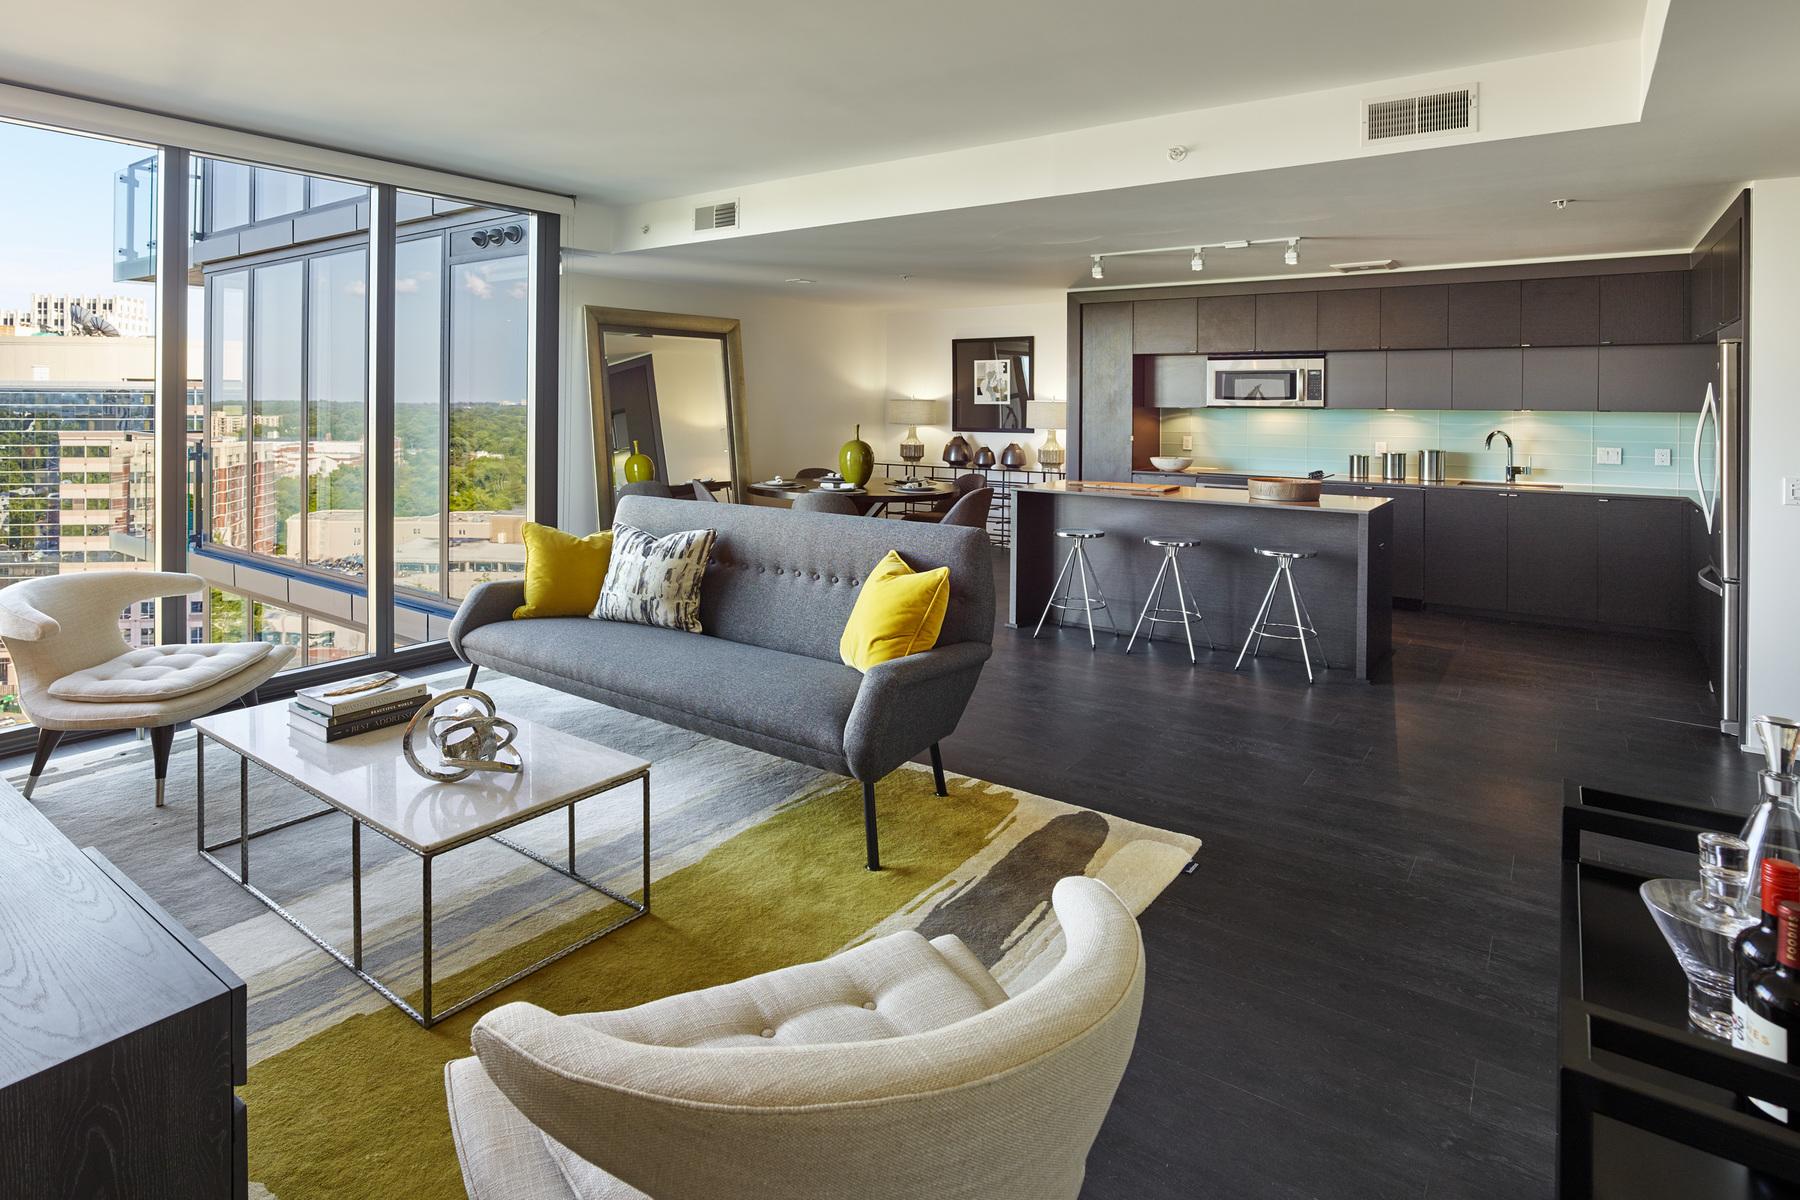 Single Family Home for Rent at 7770 Norfolk Avenue 1207, Bethesda 7770 Norfolk Ave 1207 Bethesda, Maryland 20814 United States